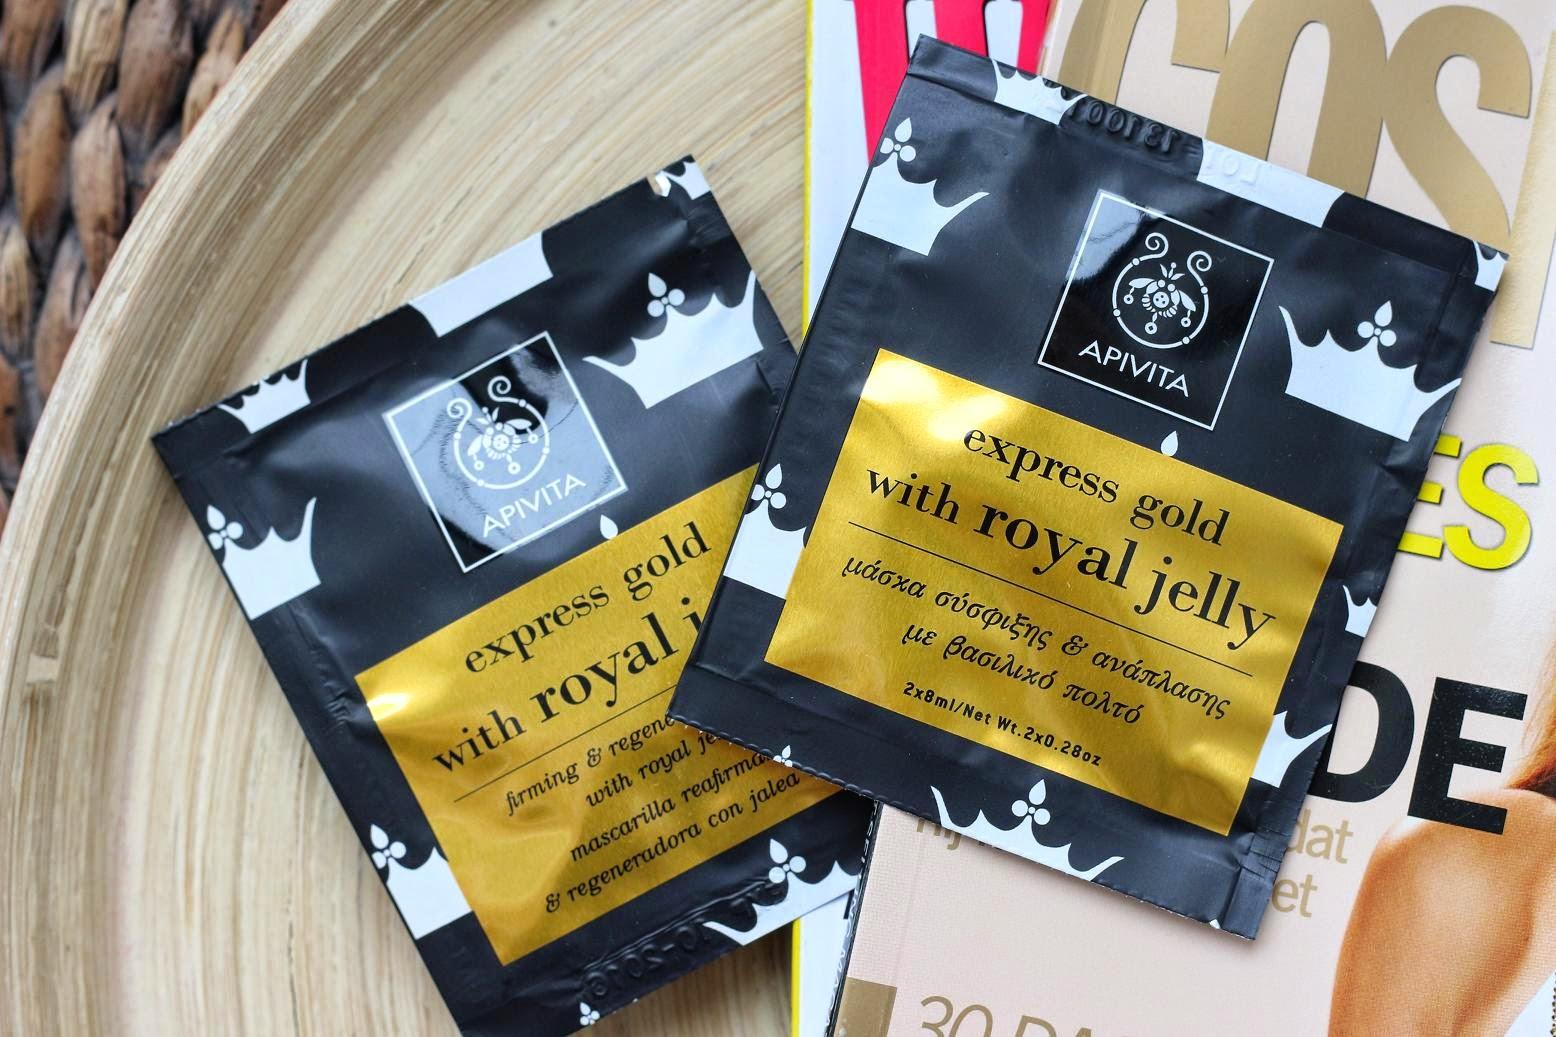 Apivita Express Gold Royal Jelly